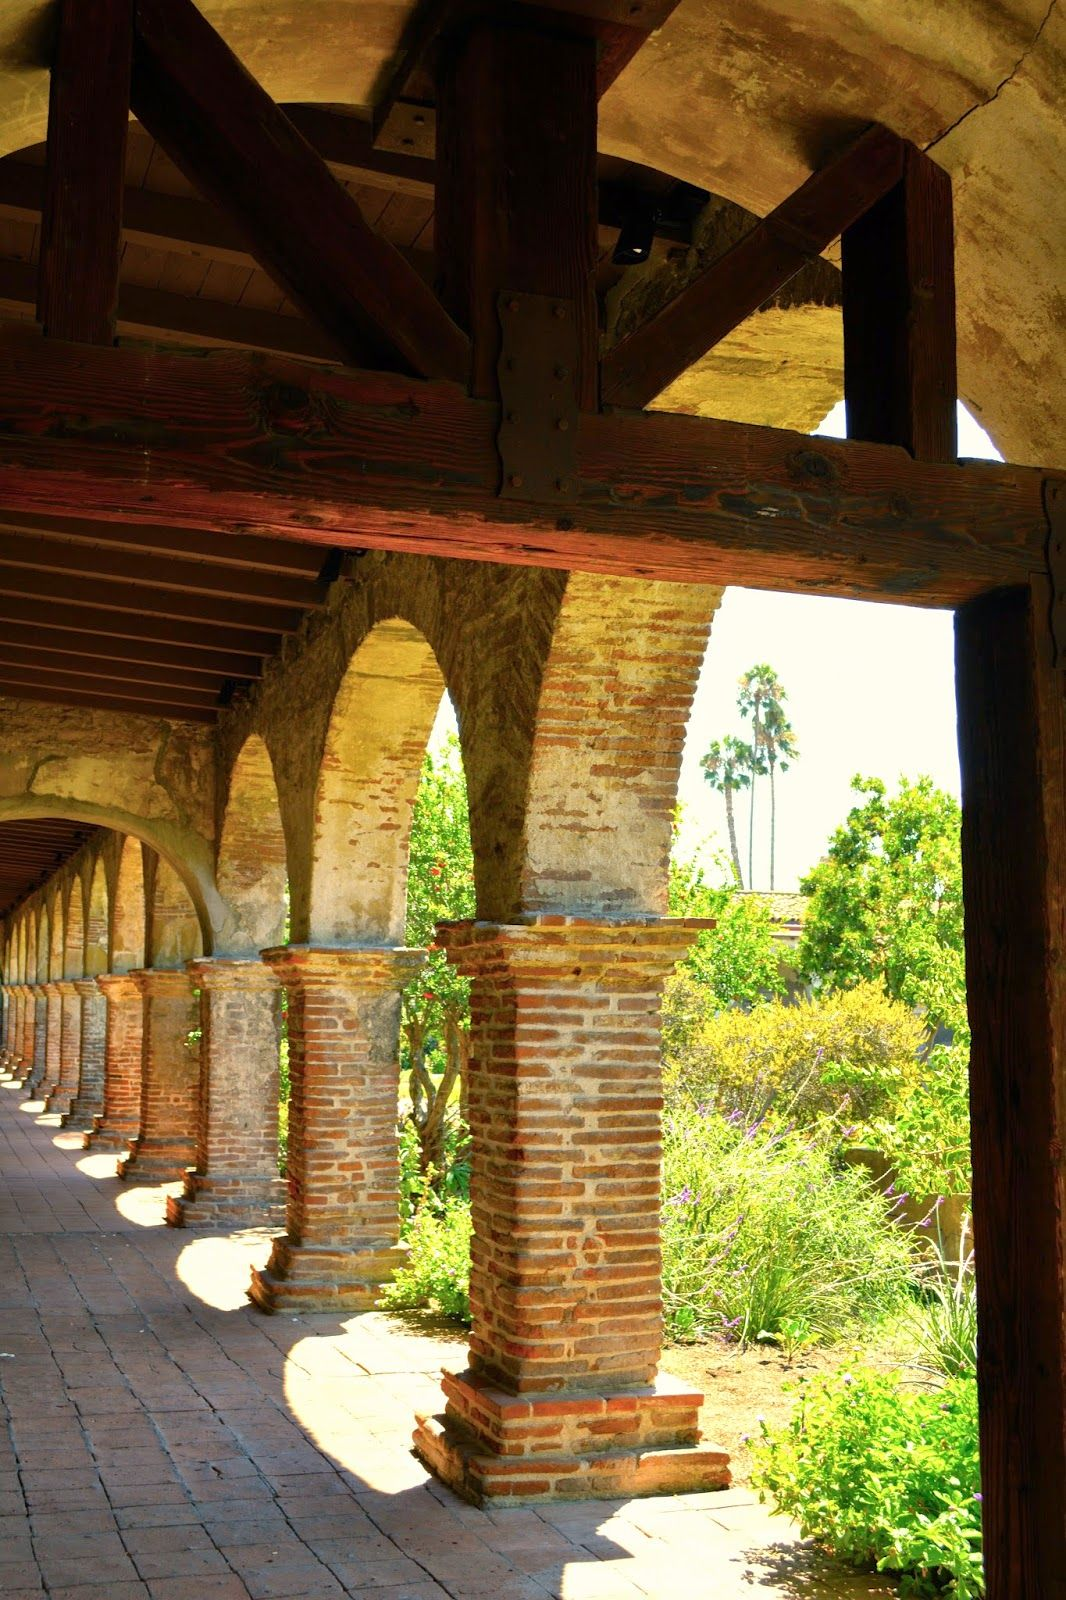 laurelwest: San Juan Capistrano